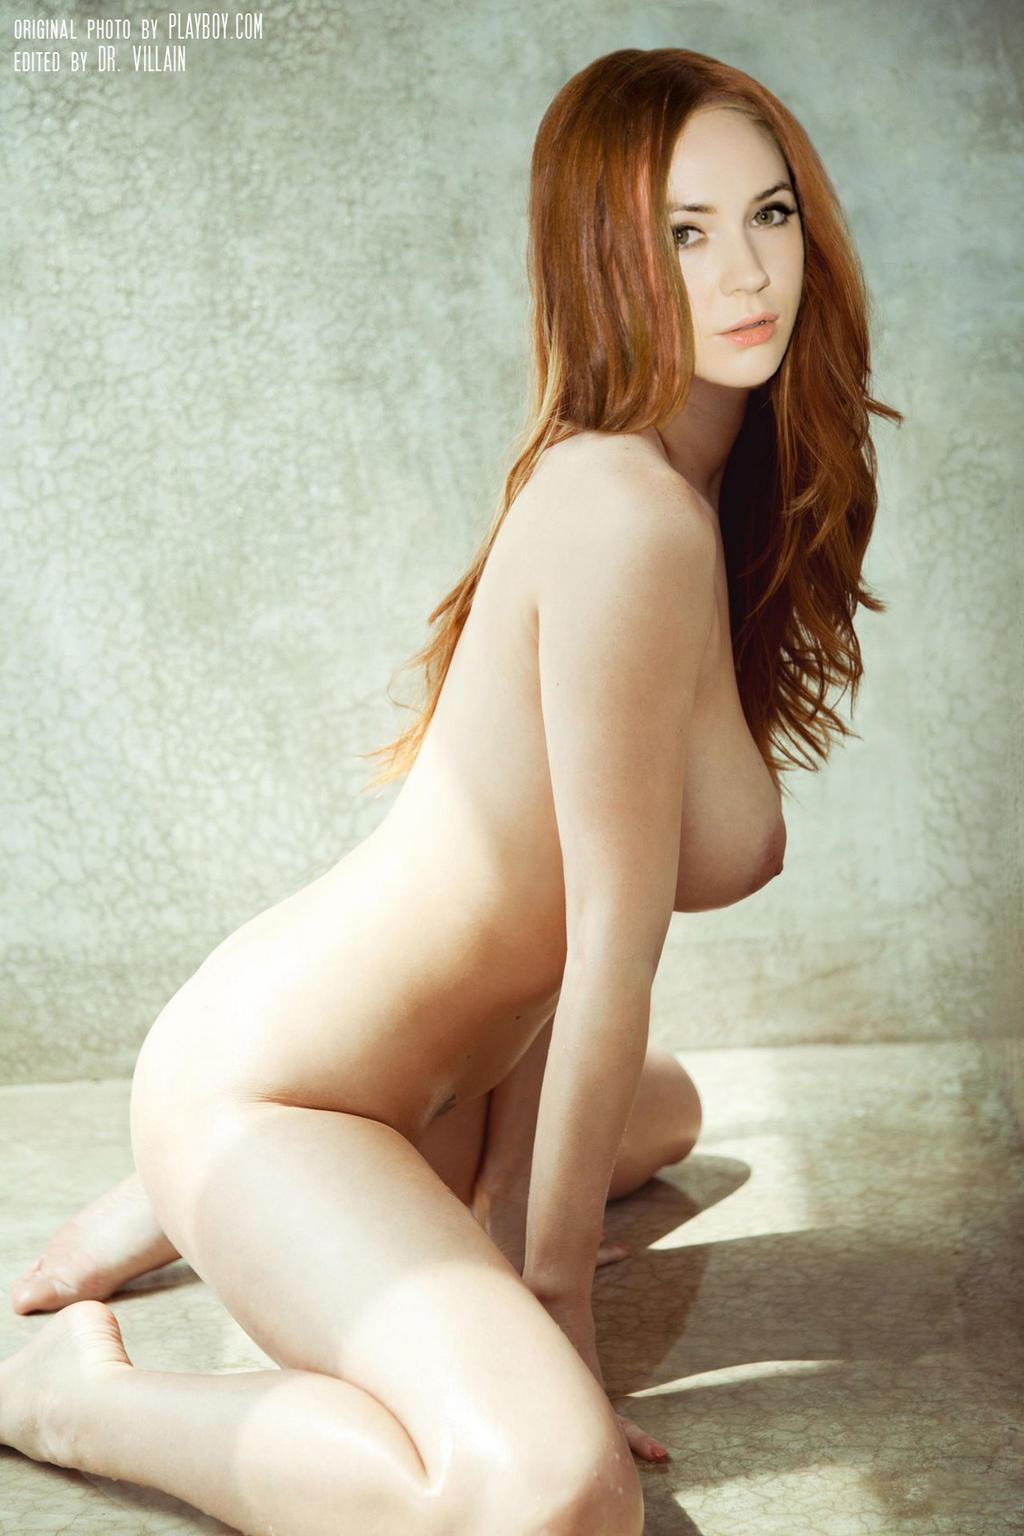 Jamey singleton nude pictures